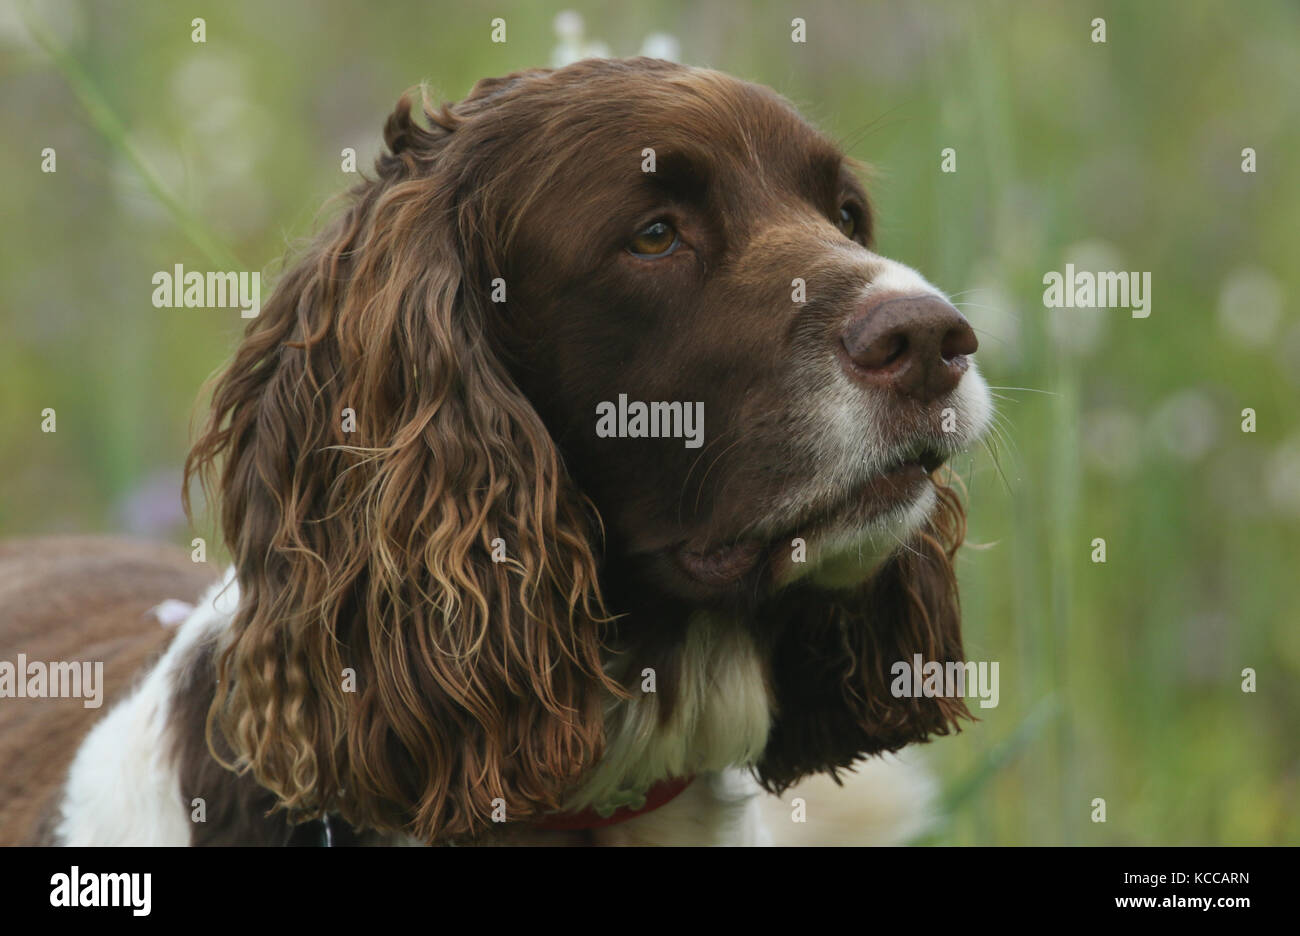 A head shot of a cute English Springer Spaniel Dog (Canis lupus familiaris). - Stock Image